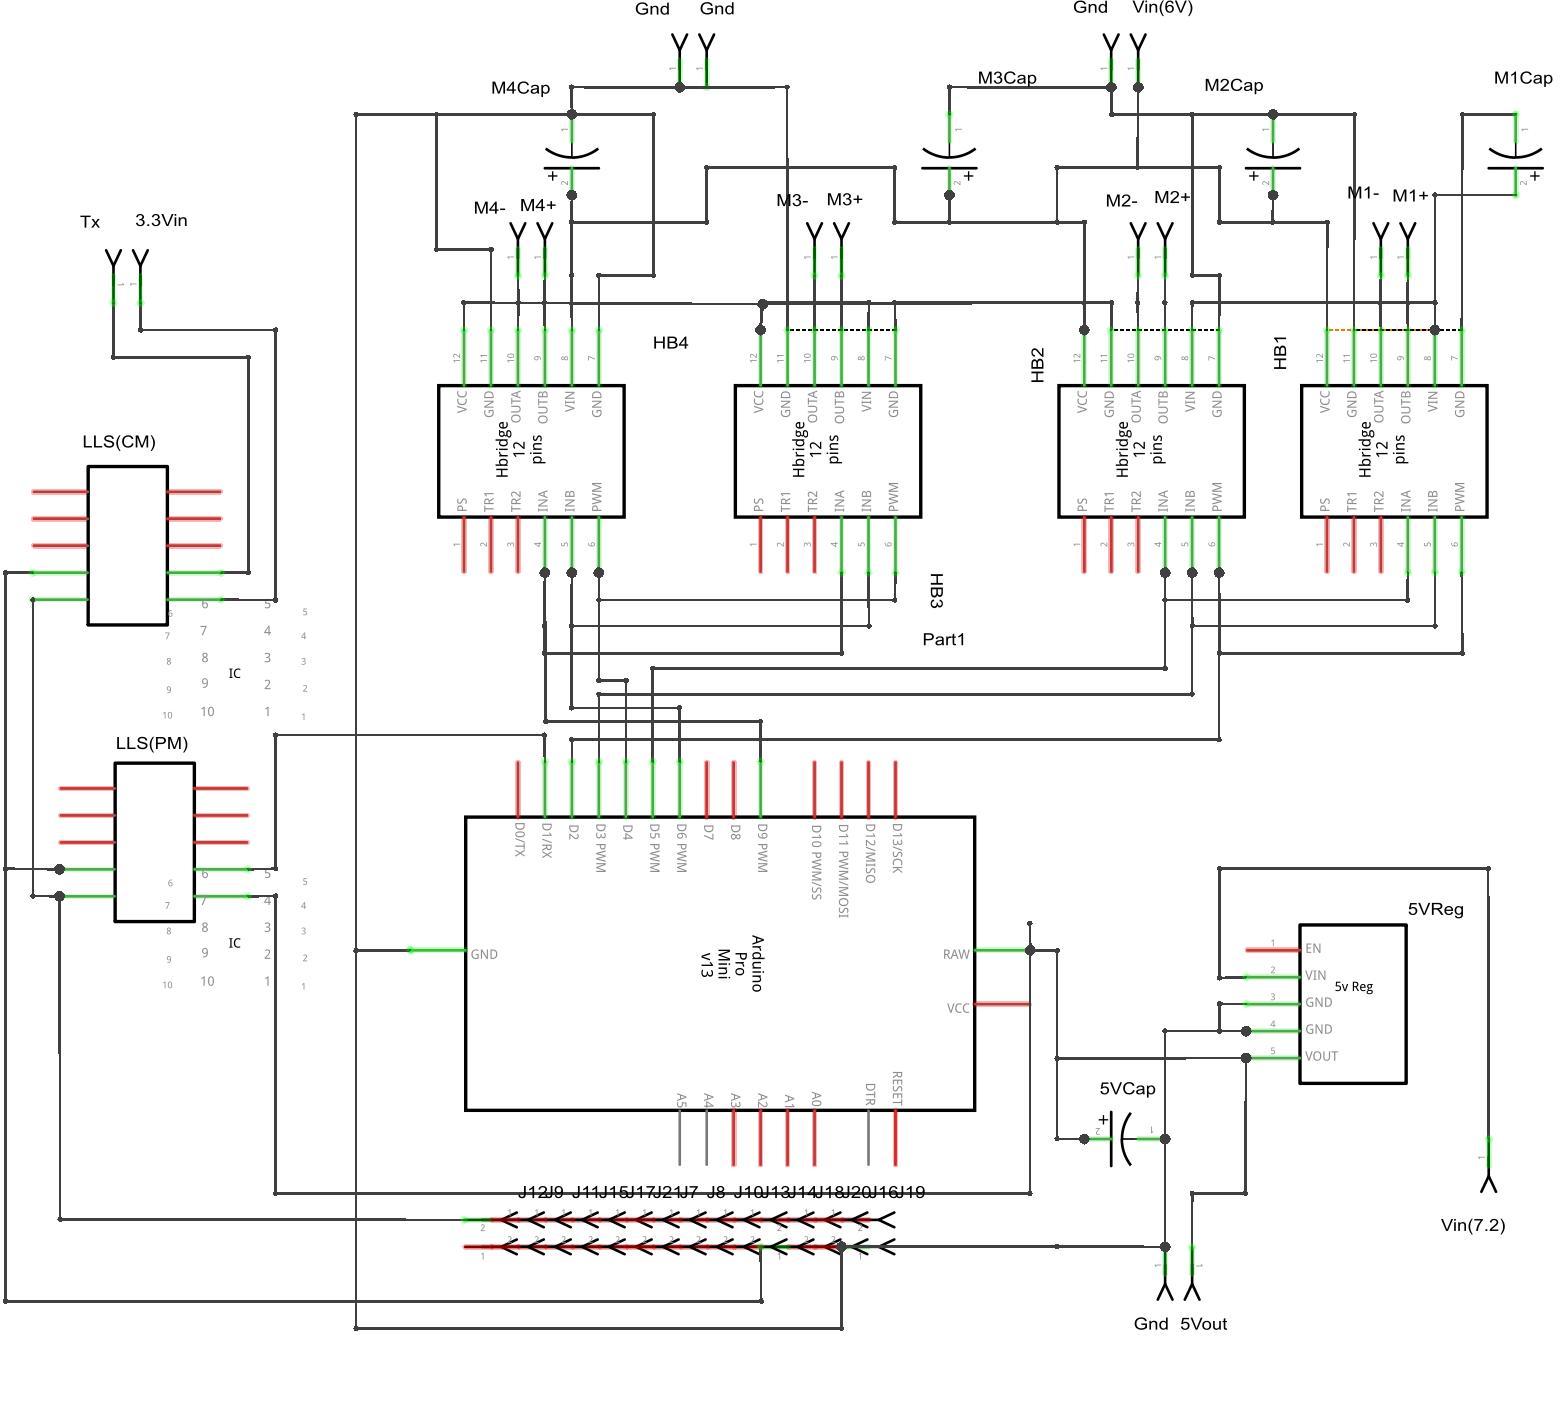 CRITR/pcb gen2 - Lofaro Lab Wiki